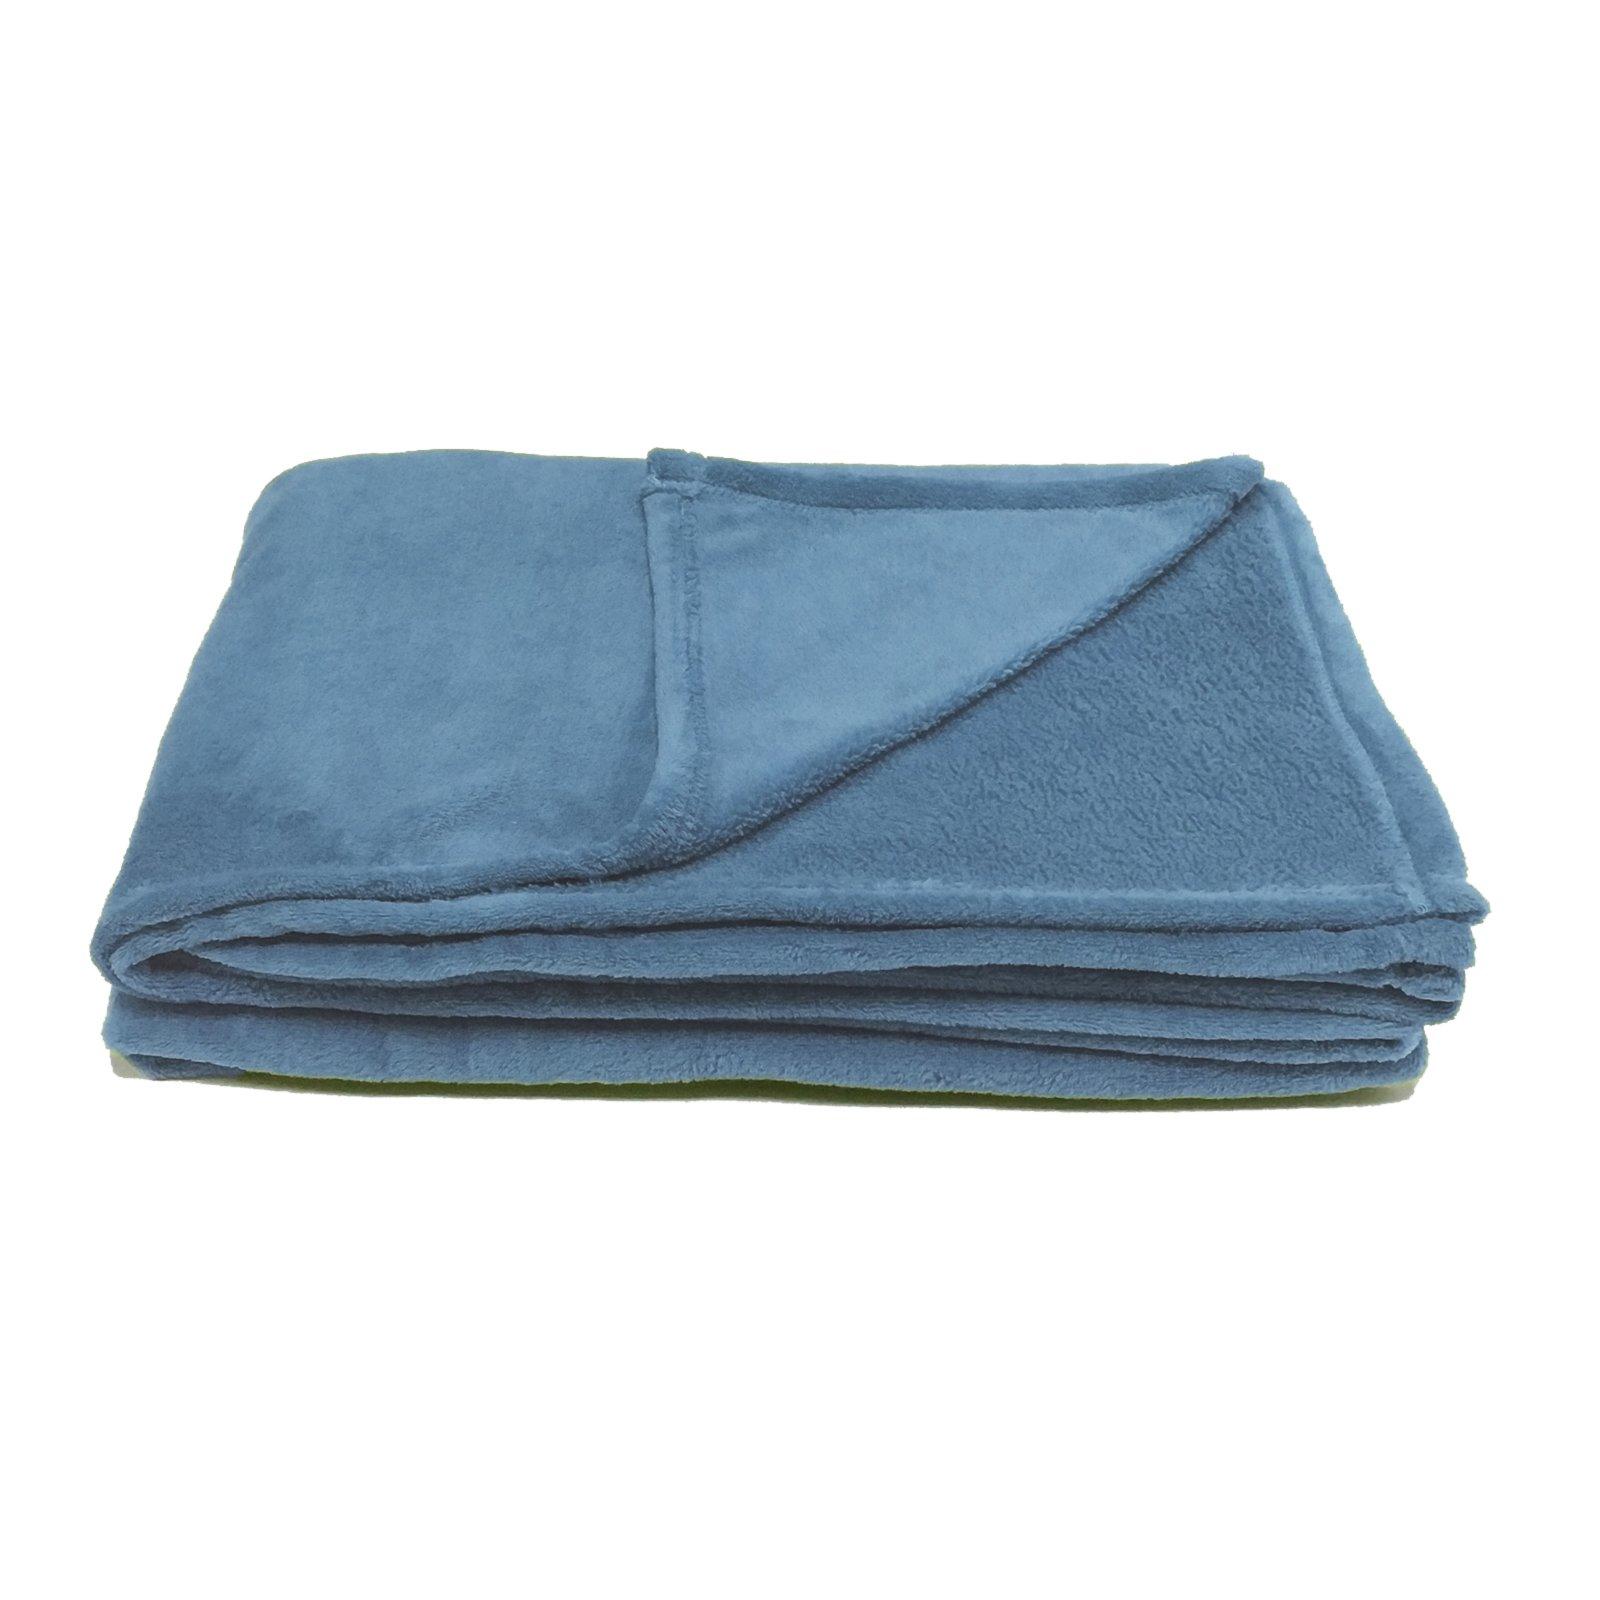 Microfaserdecke CORAL - blau - 150x200 cm